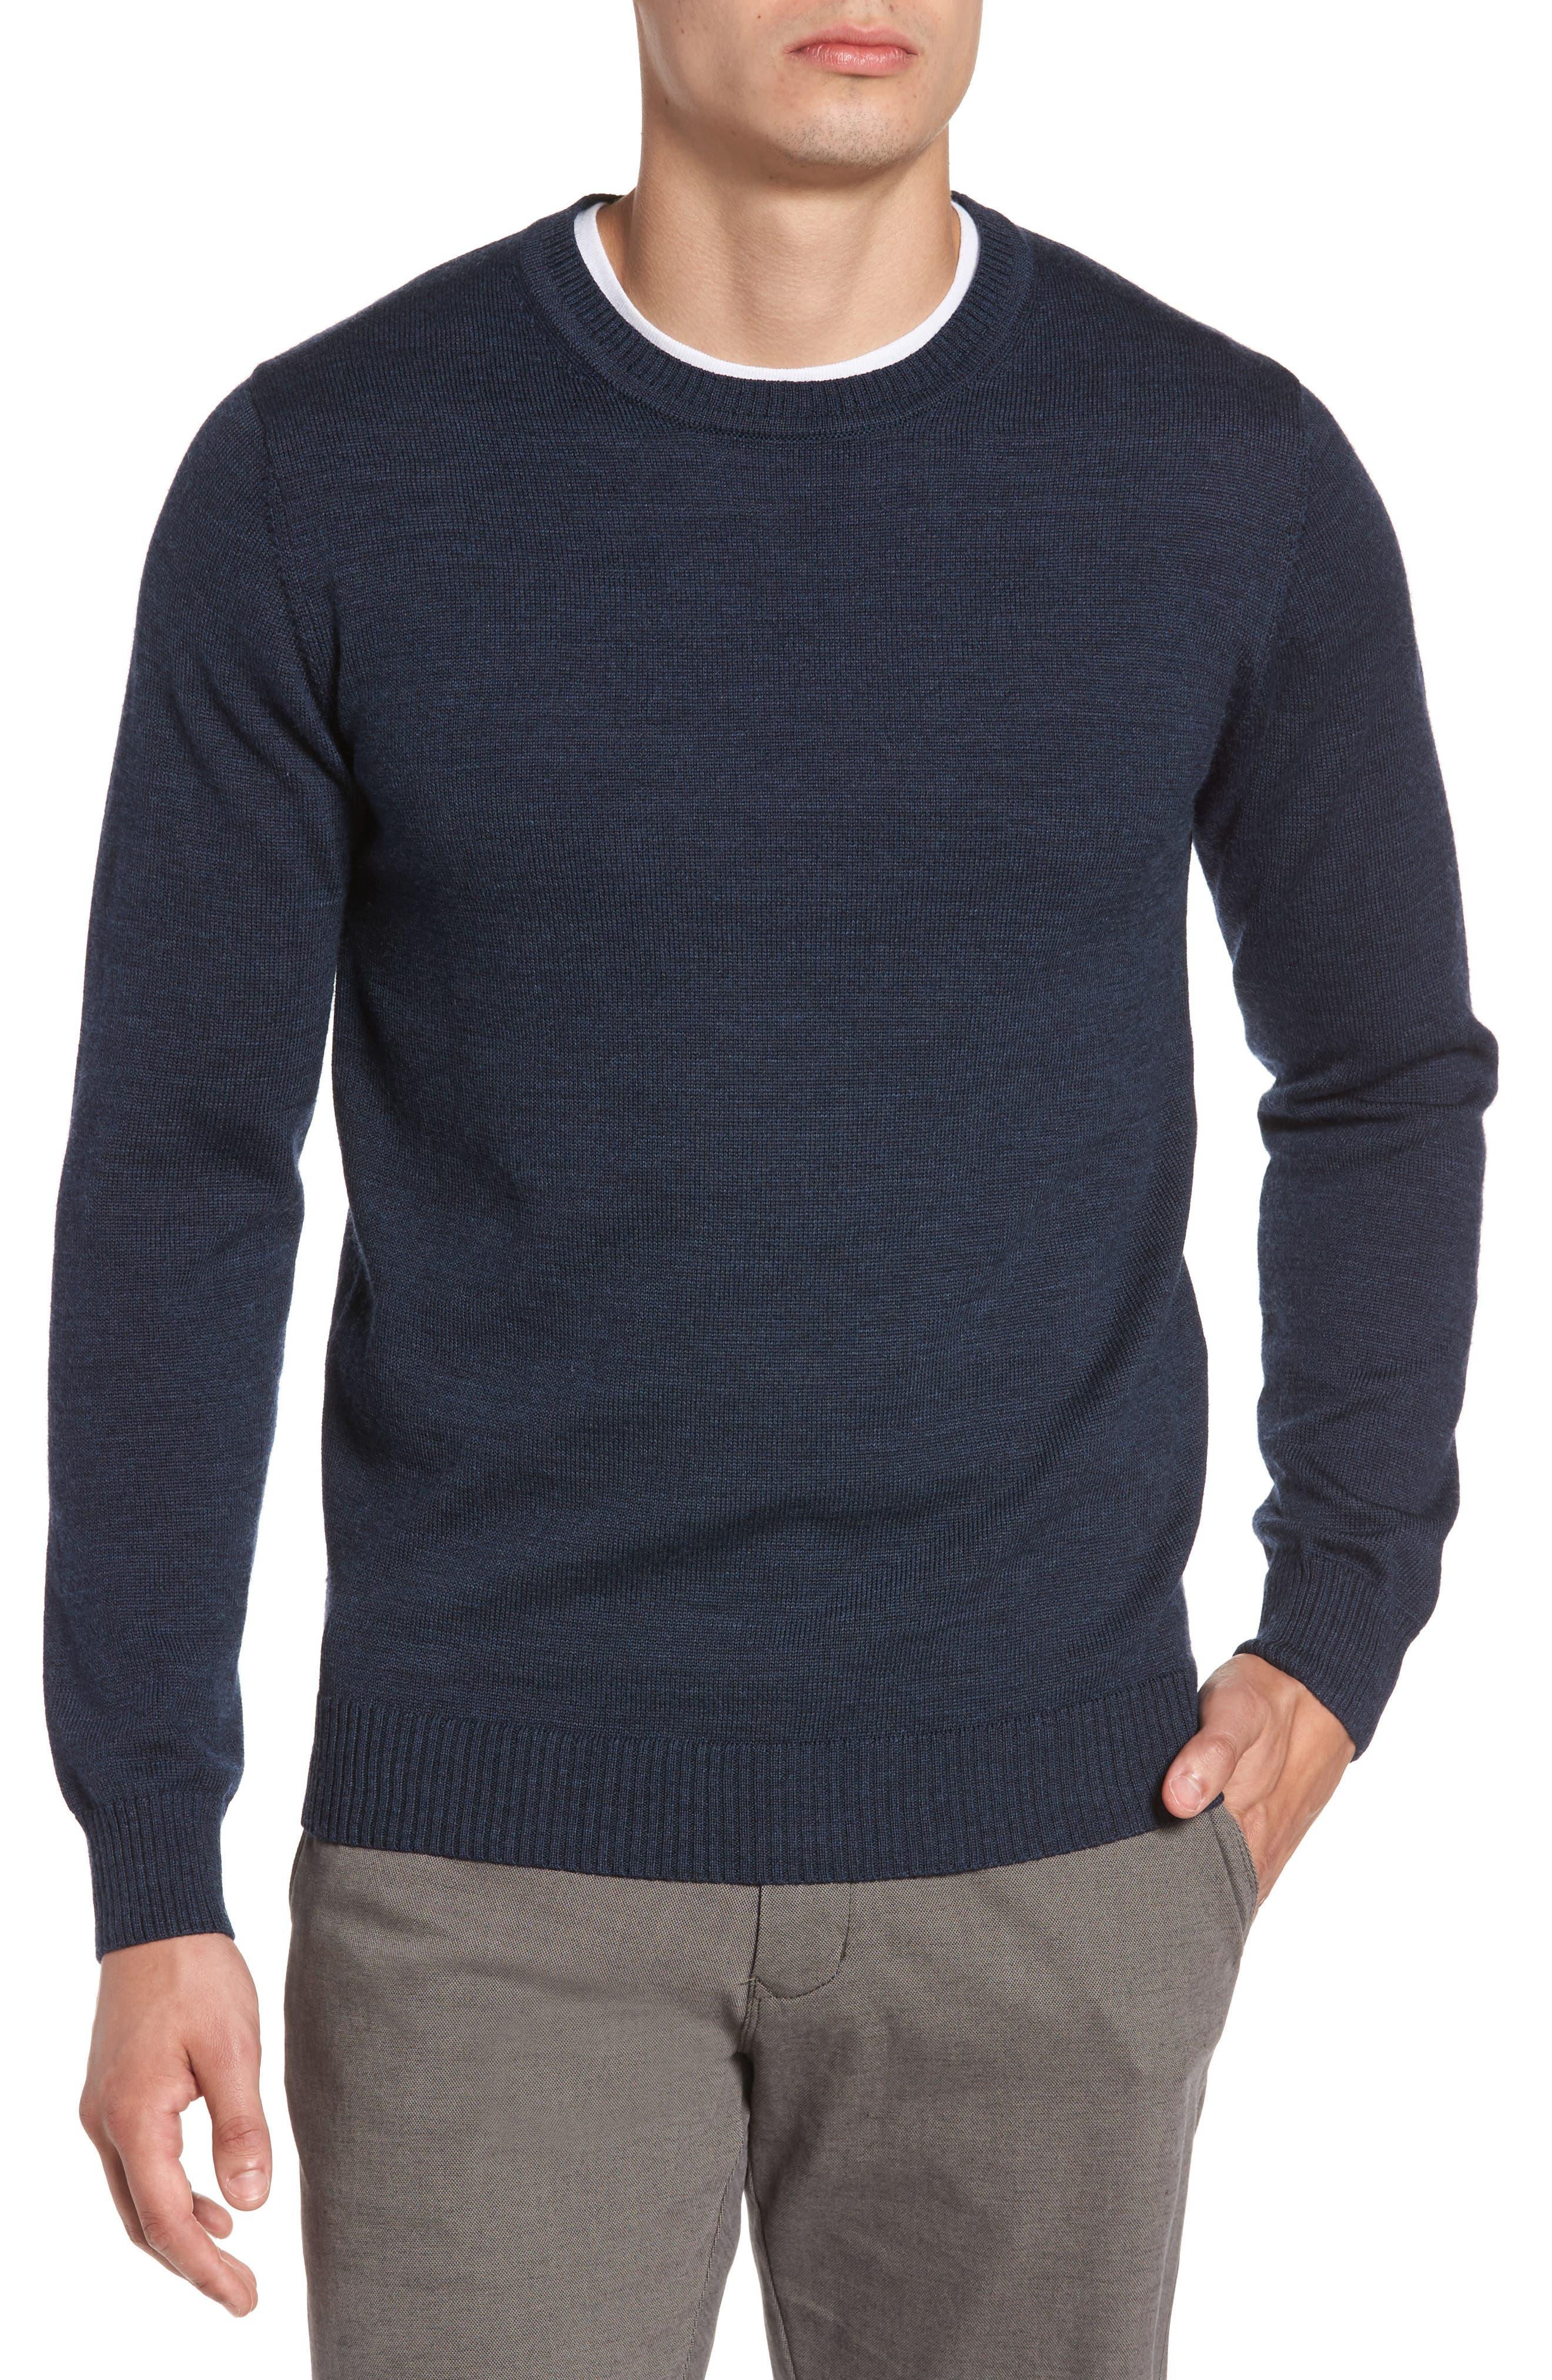 Bannockburn Mélange Merino Wool Sweater,                         Main,                         color, 401